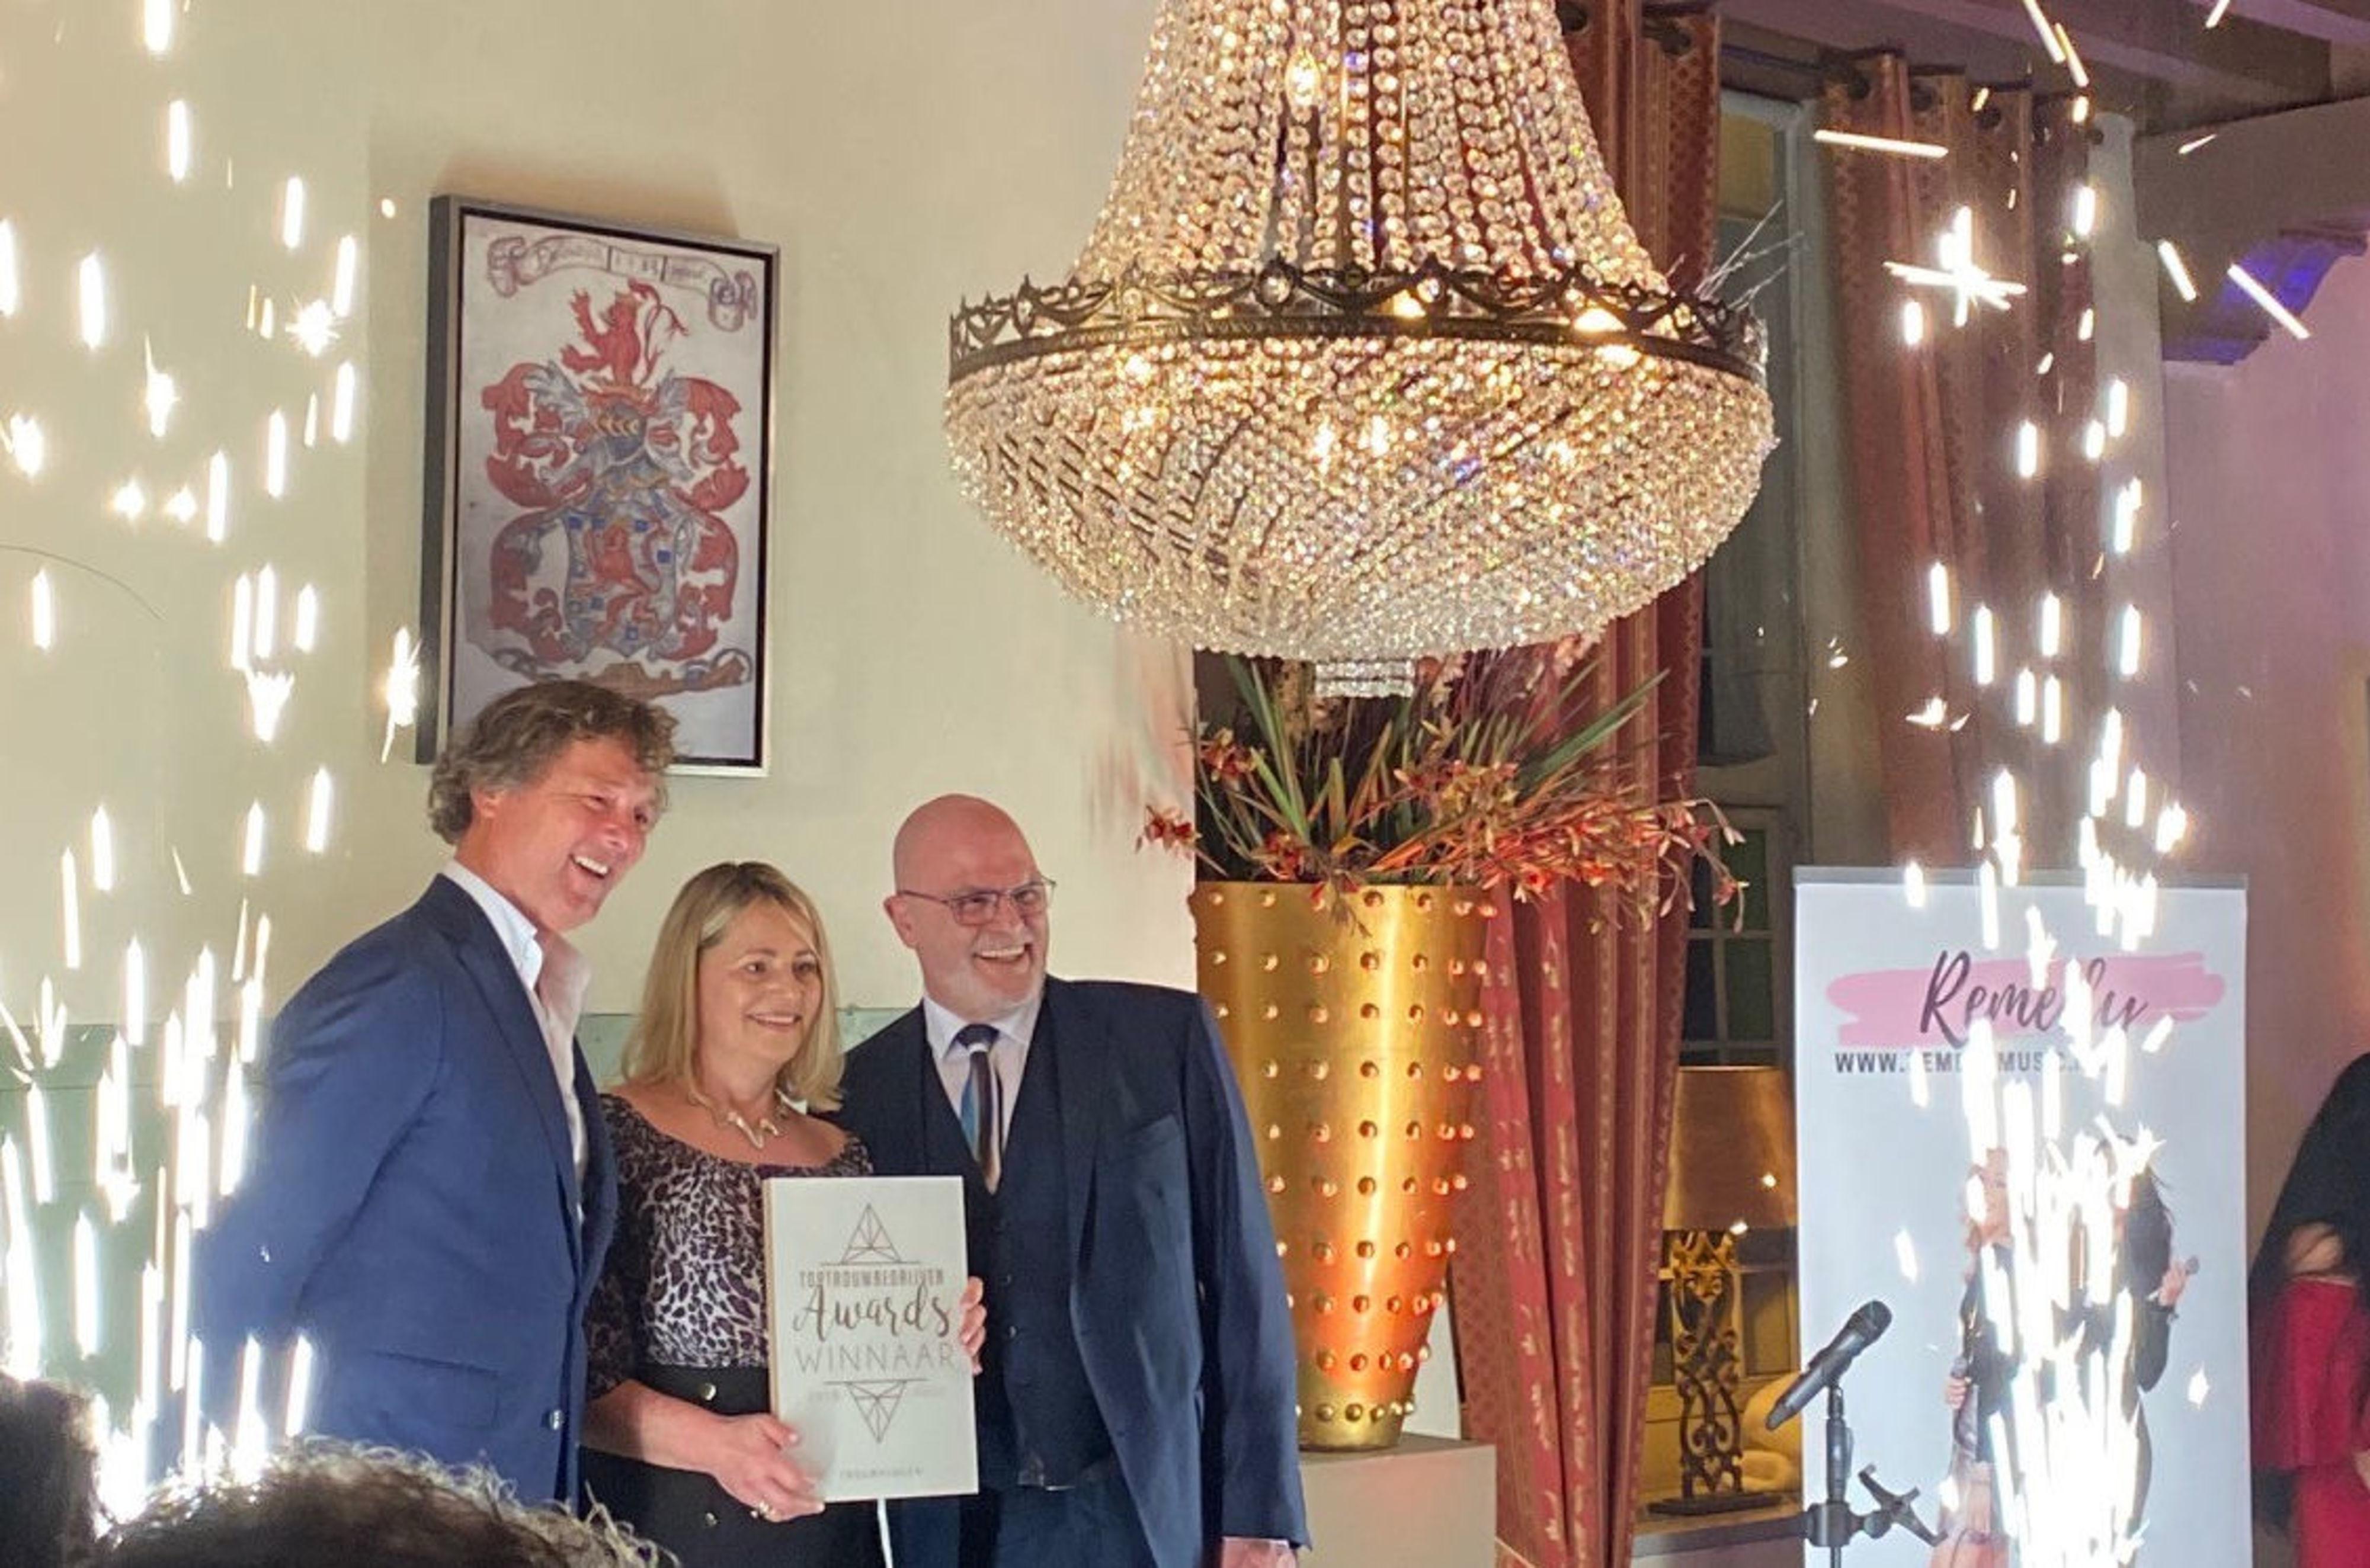 Rozenhof Trouwringen wint TopTrouwbedrijven Award